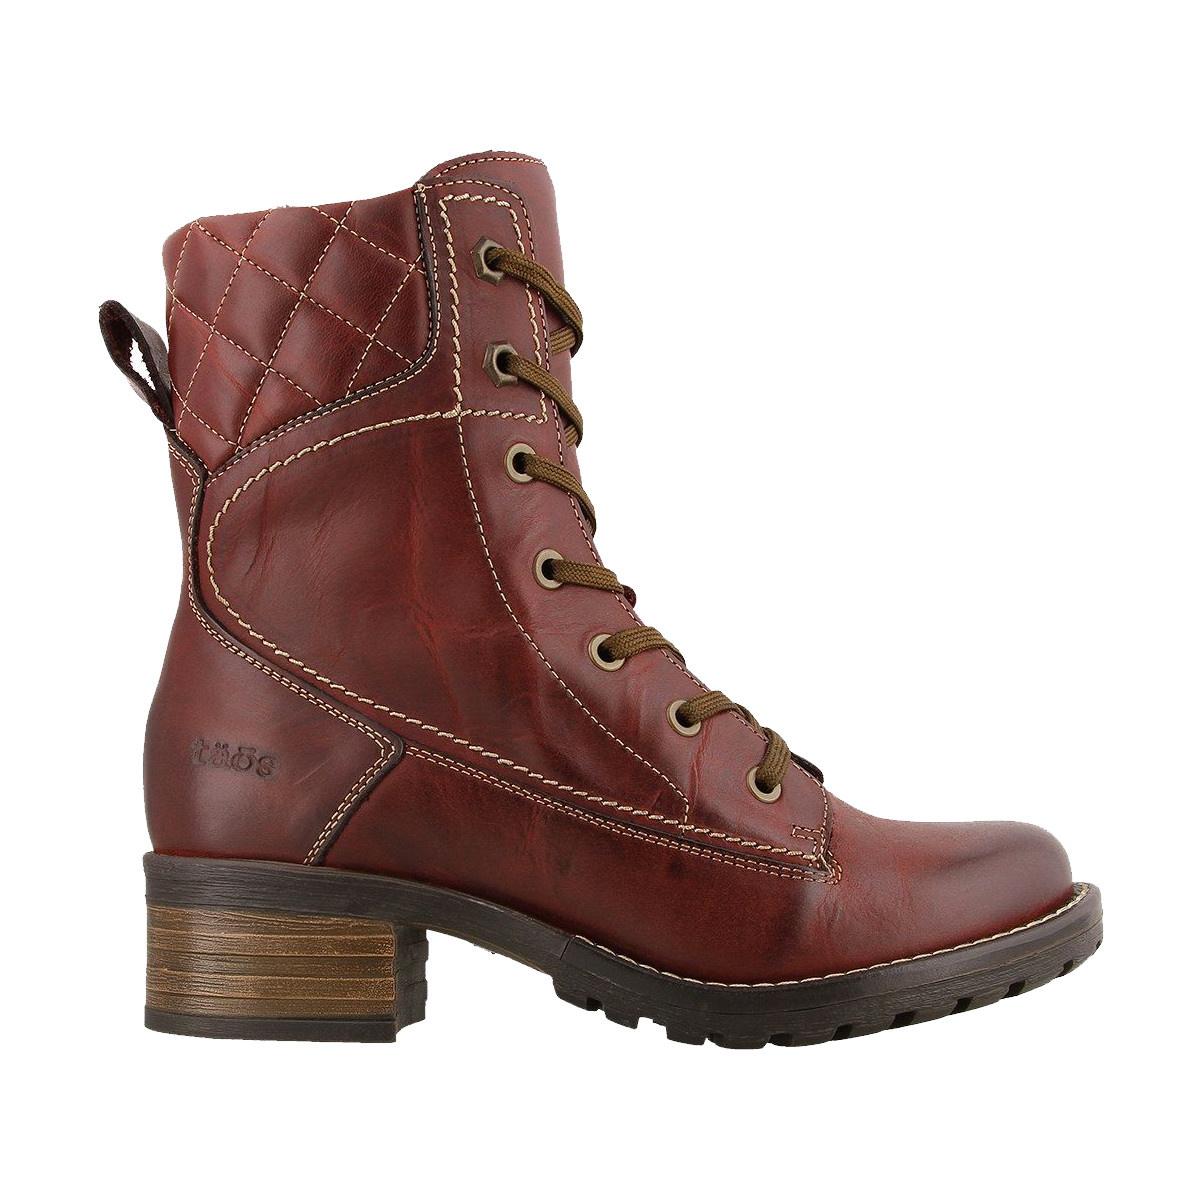 Taos Footwear Taos Women's Factor Deep Red